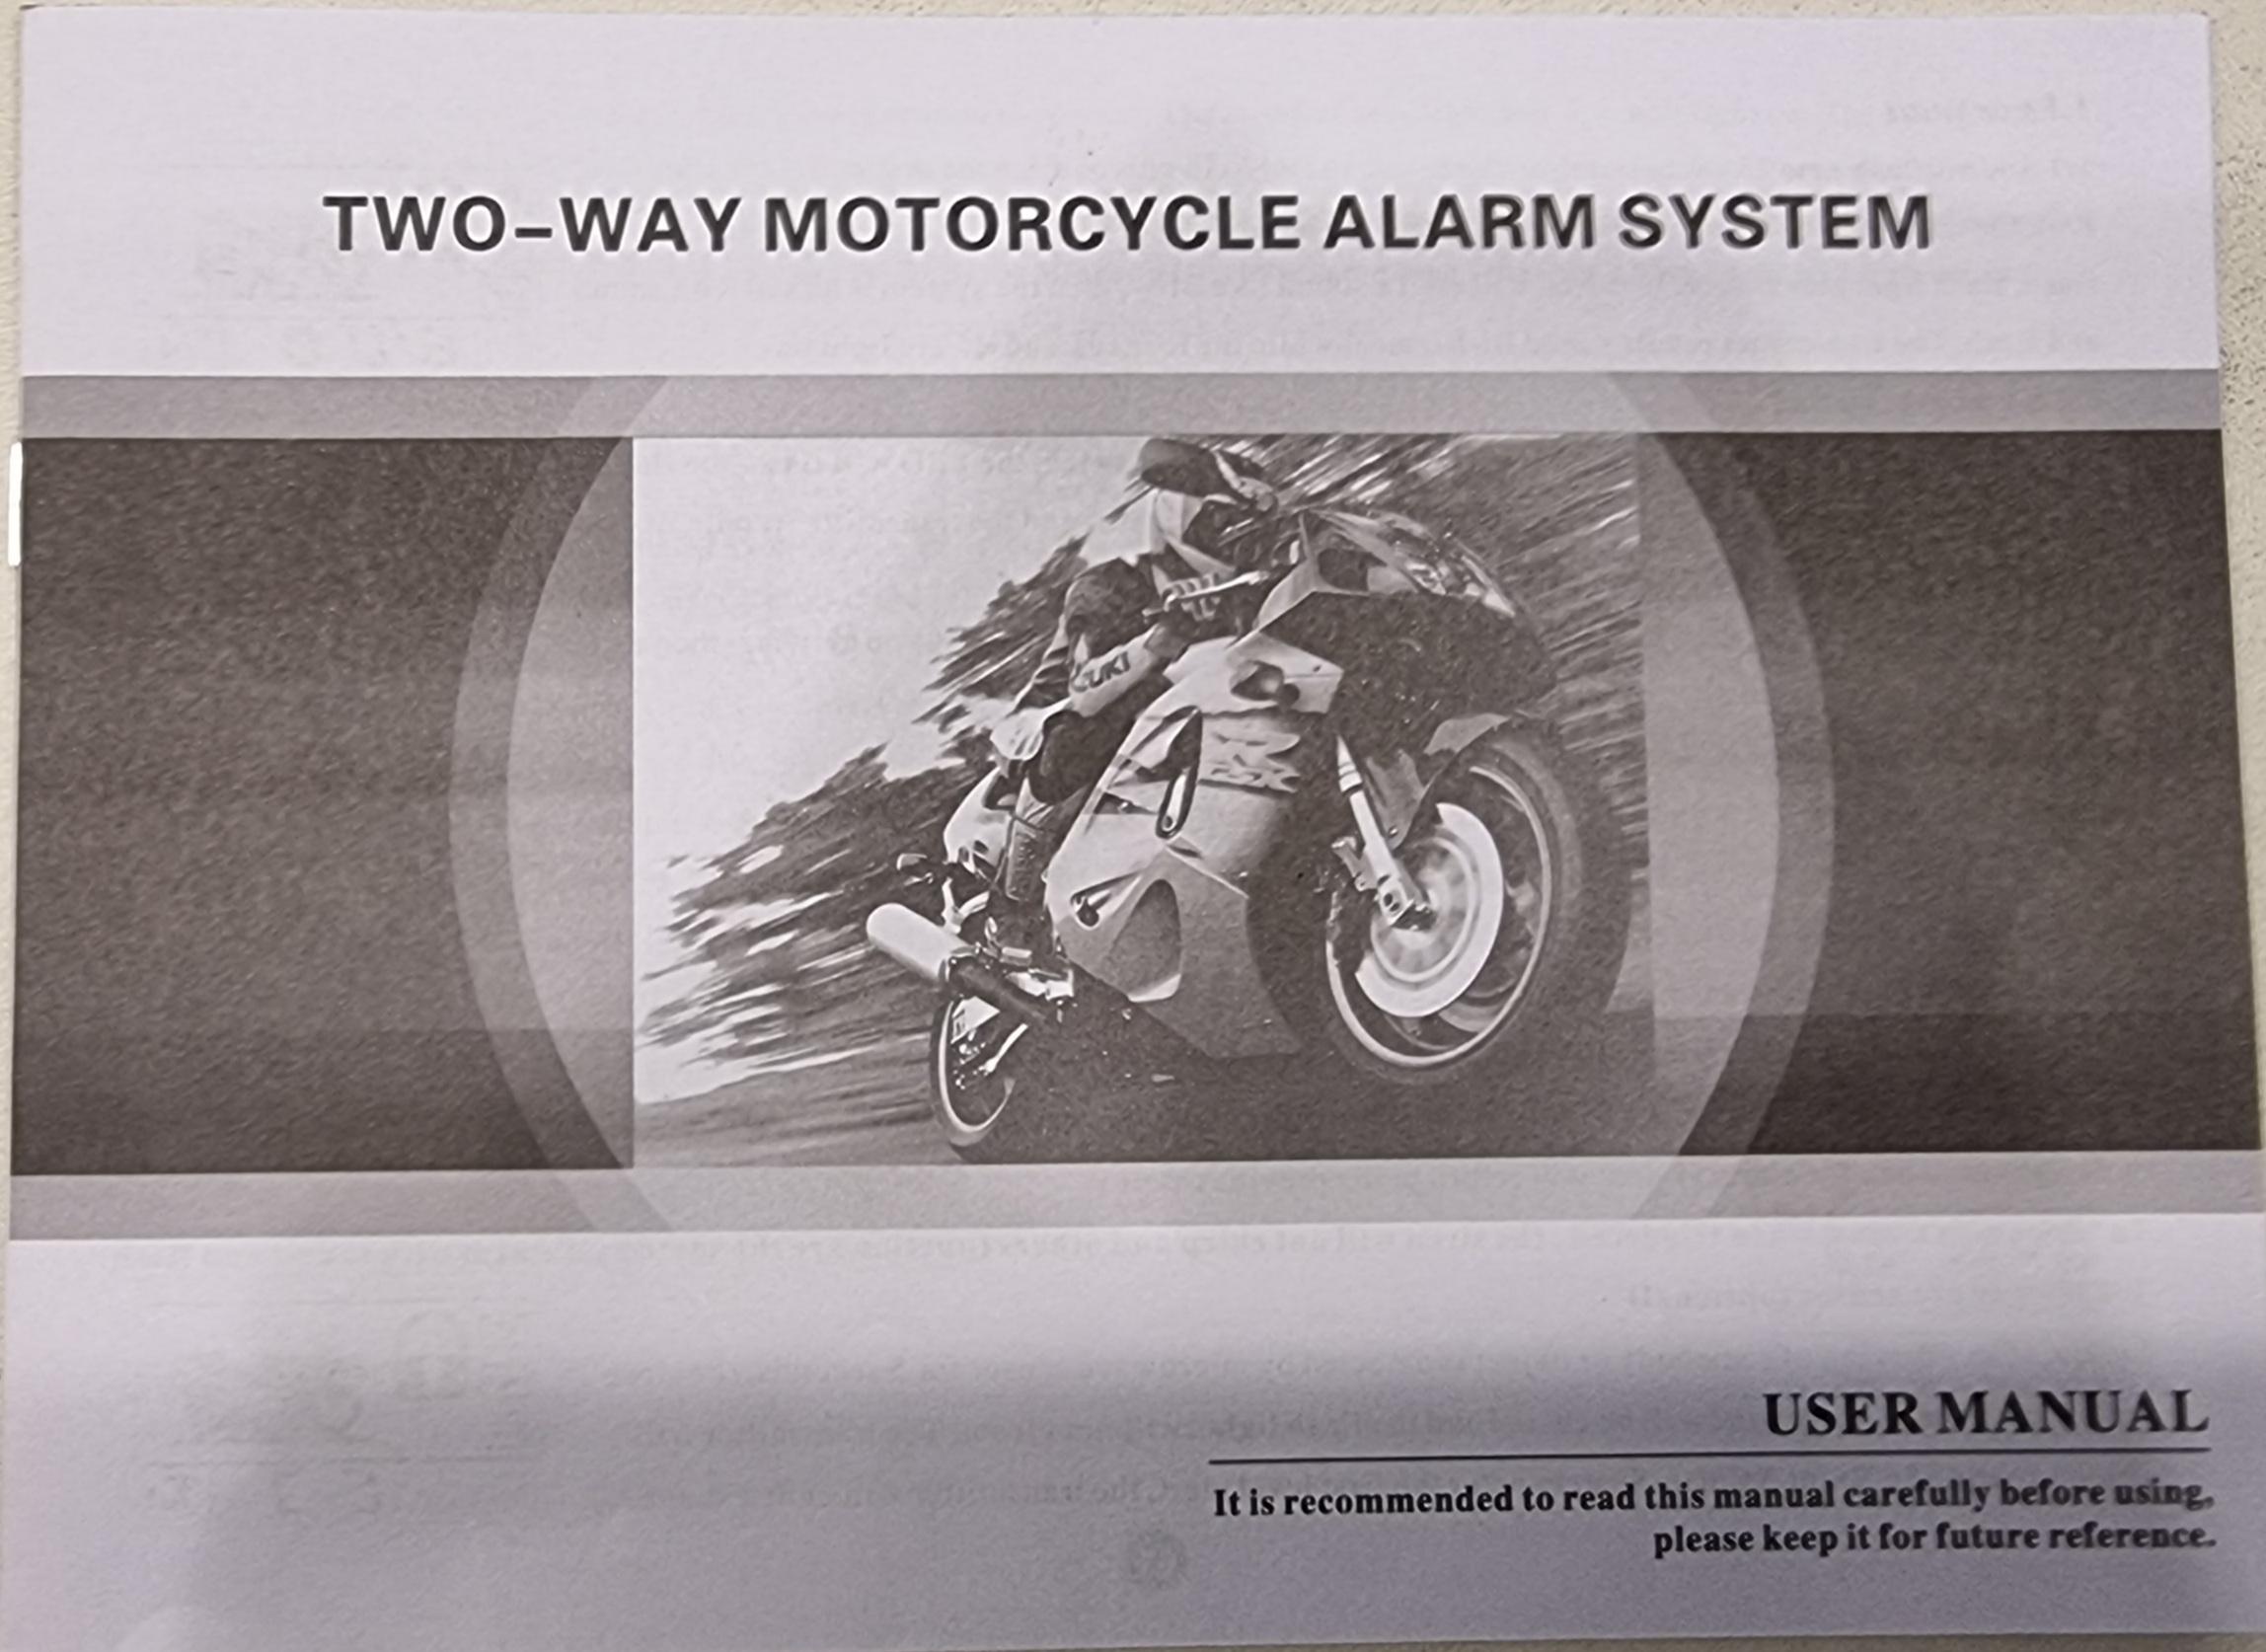 Alarme Easyguard EM 212 20210923-090622